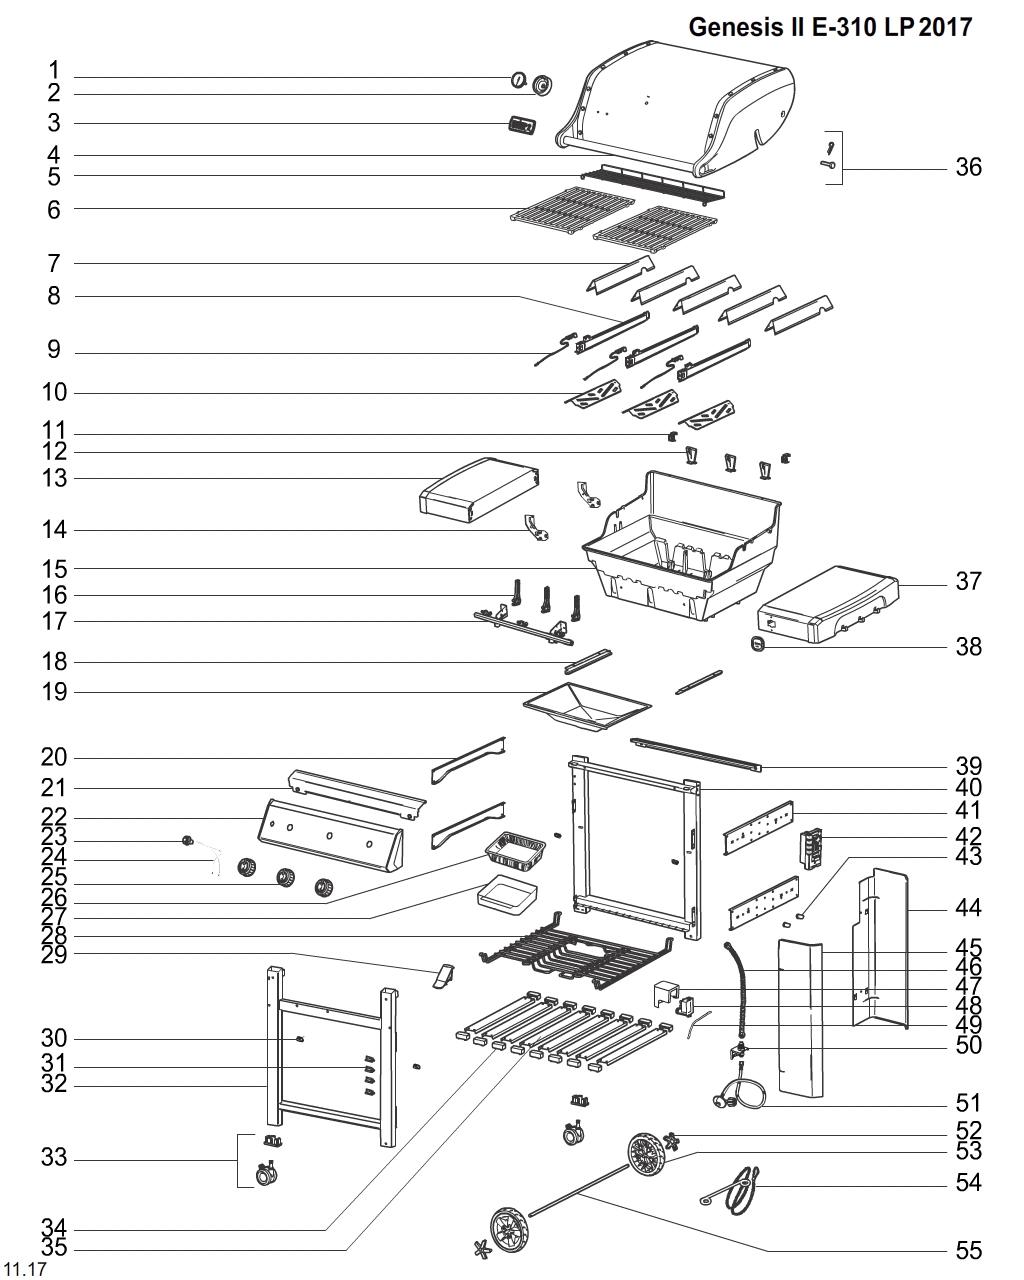 [DIAGRAM_34OR]  Weber Grill Schematics   Weber Grill Models   Weber Wiring Diagrams      Weber Grill Schematics   Weber Grill Models